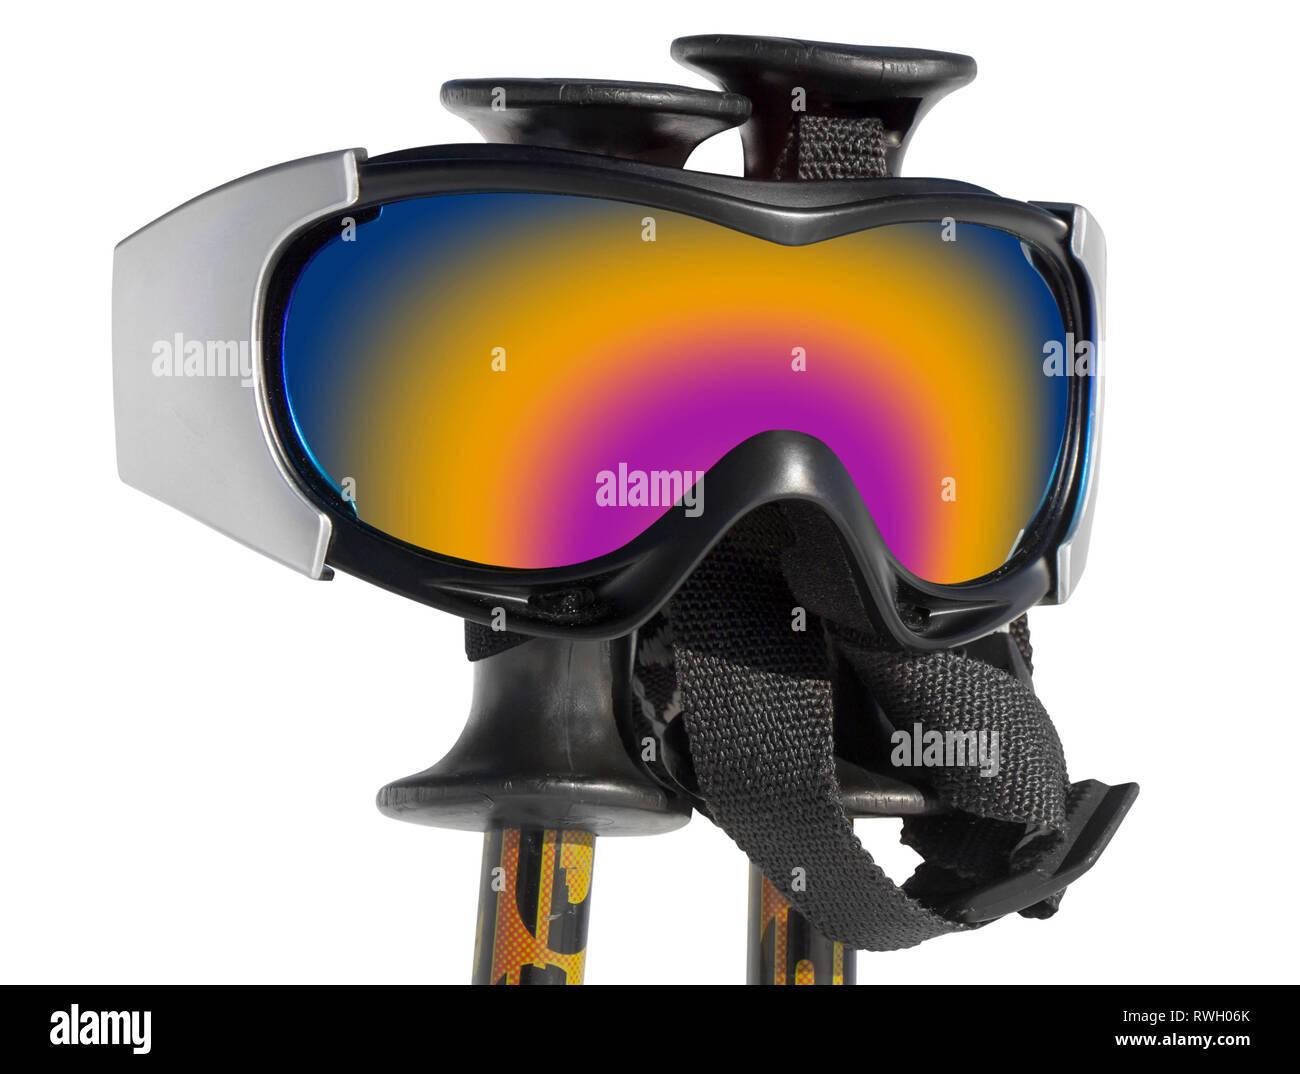 Close up of the ski goggles on ski sticks isolated on white backgraund - Stock Image